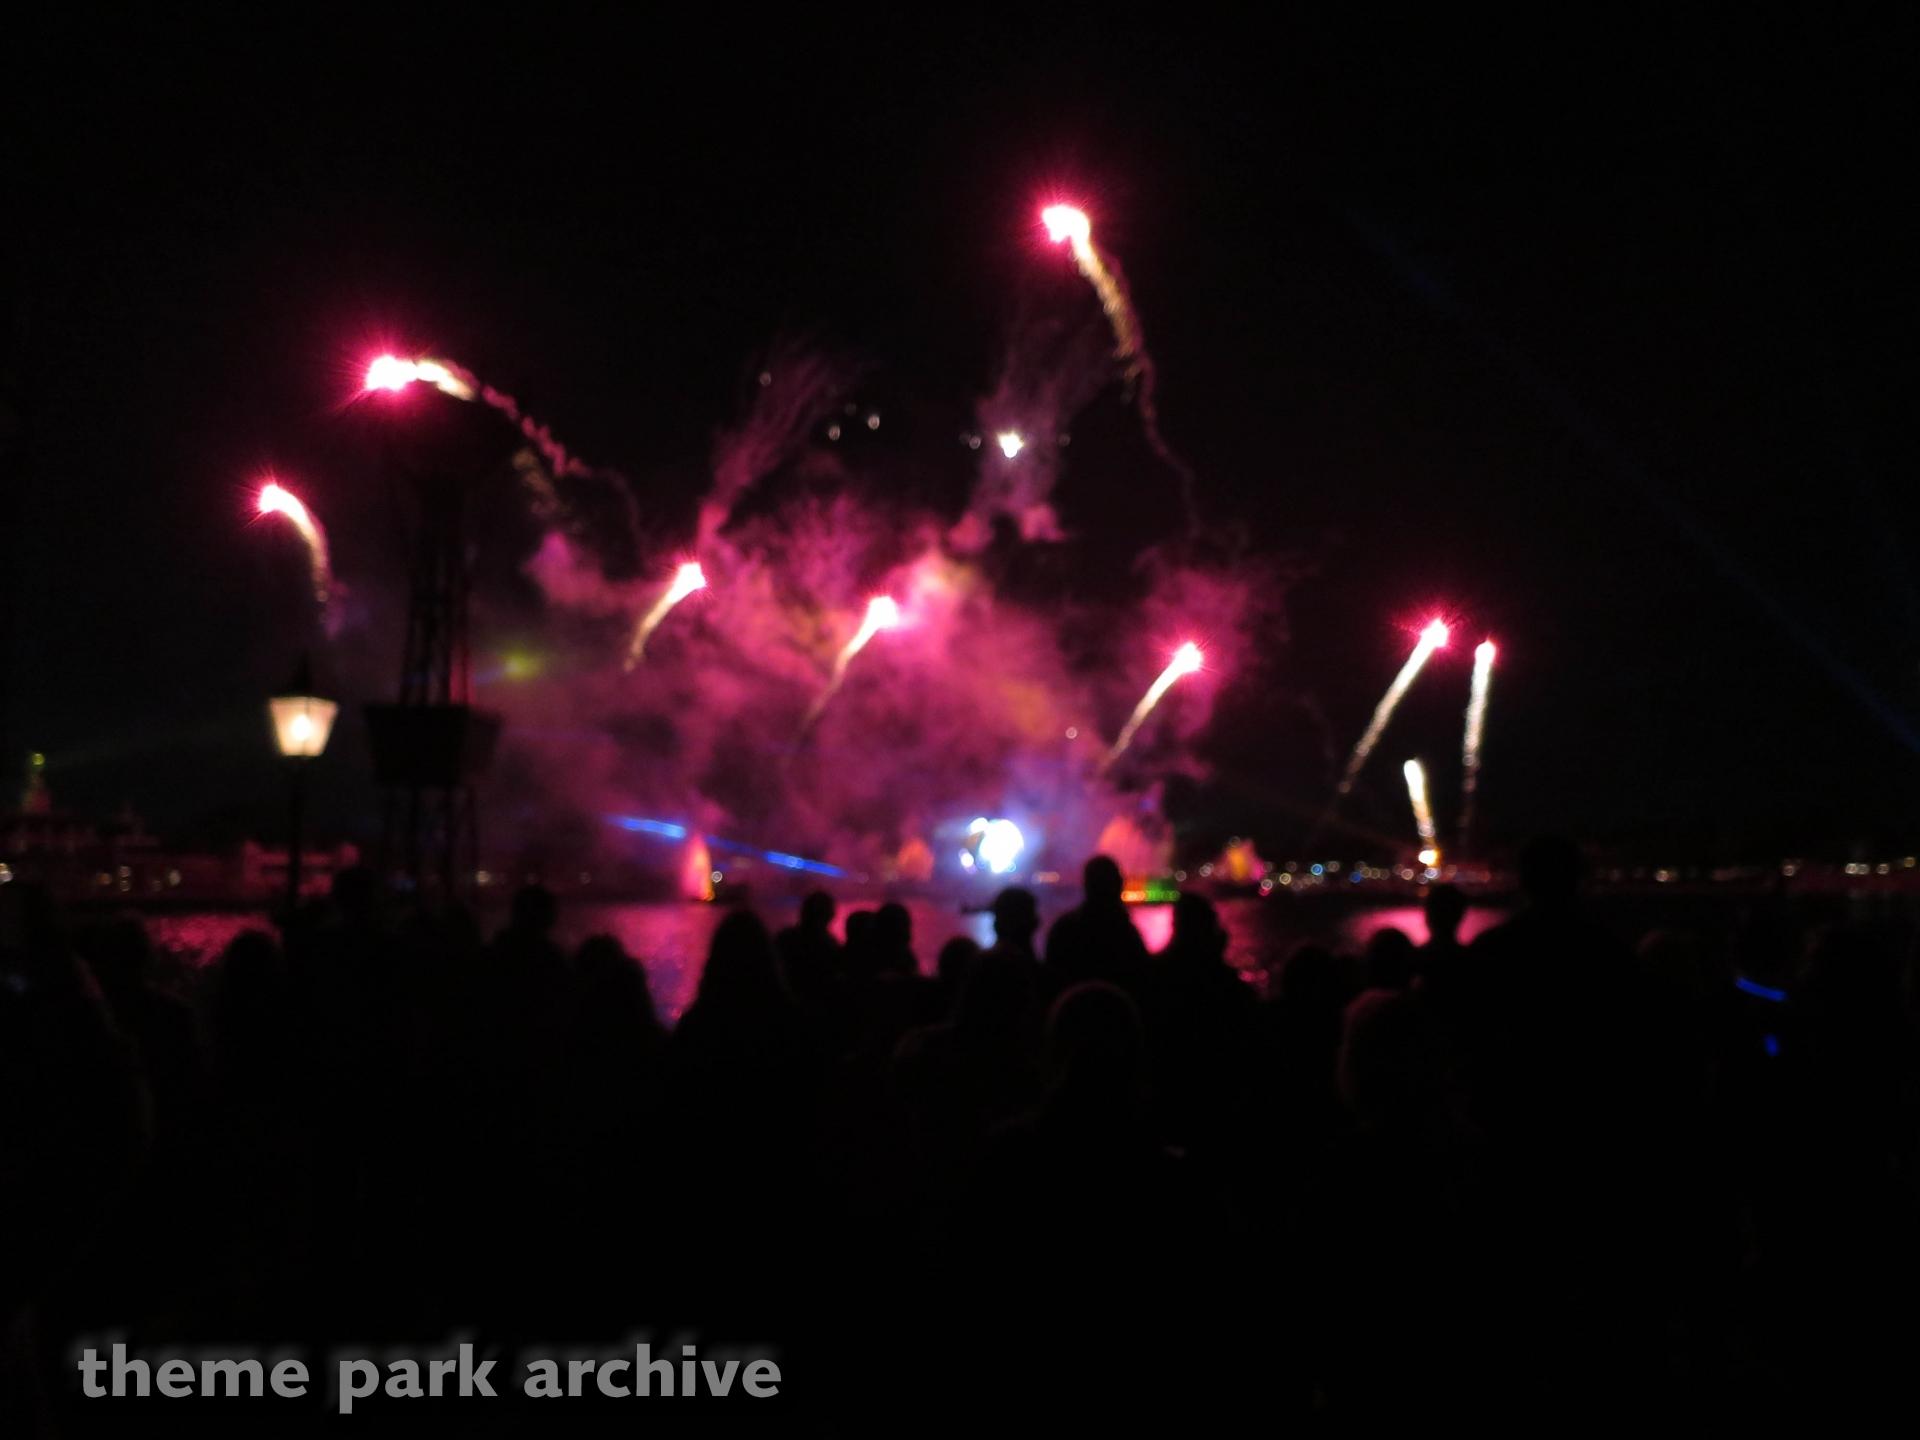 World Showcase at EPCOT